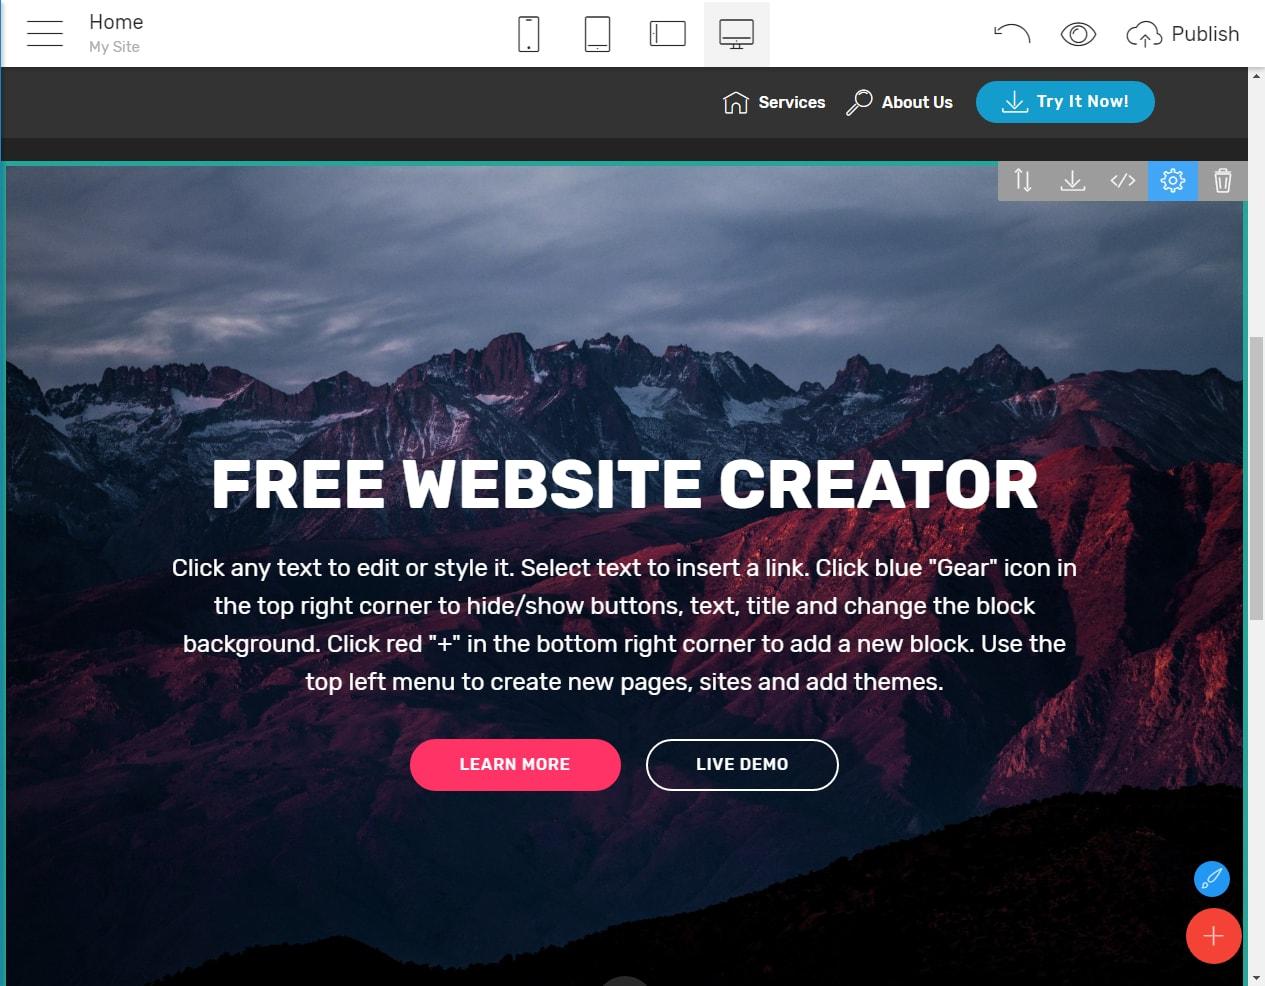 Free Site Creator